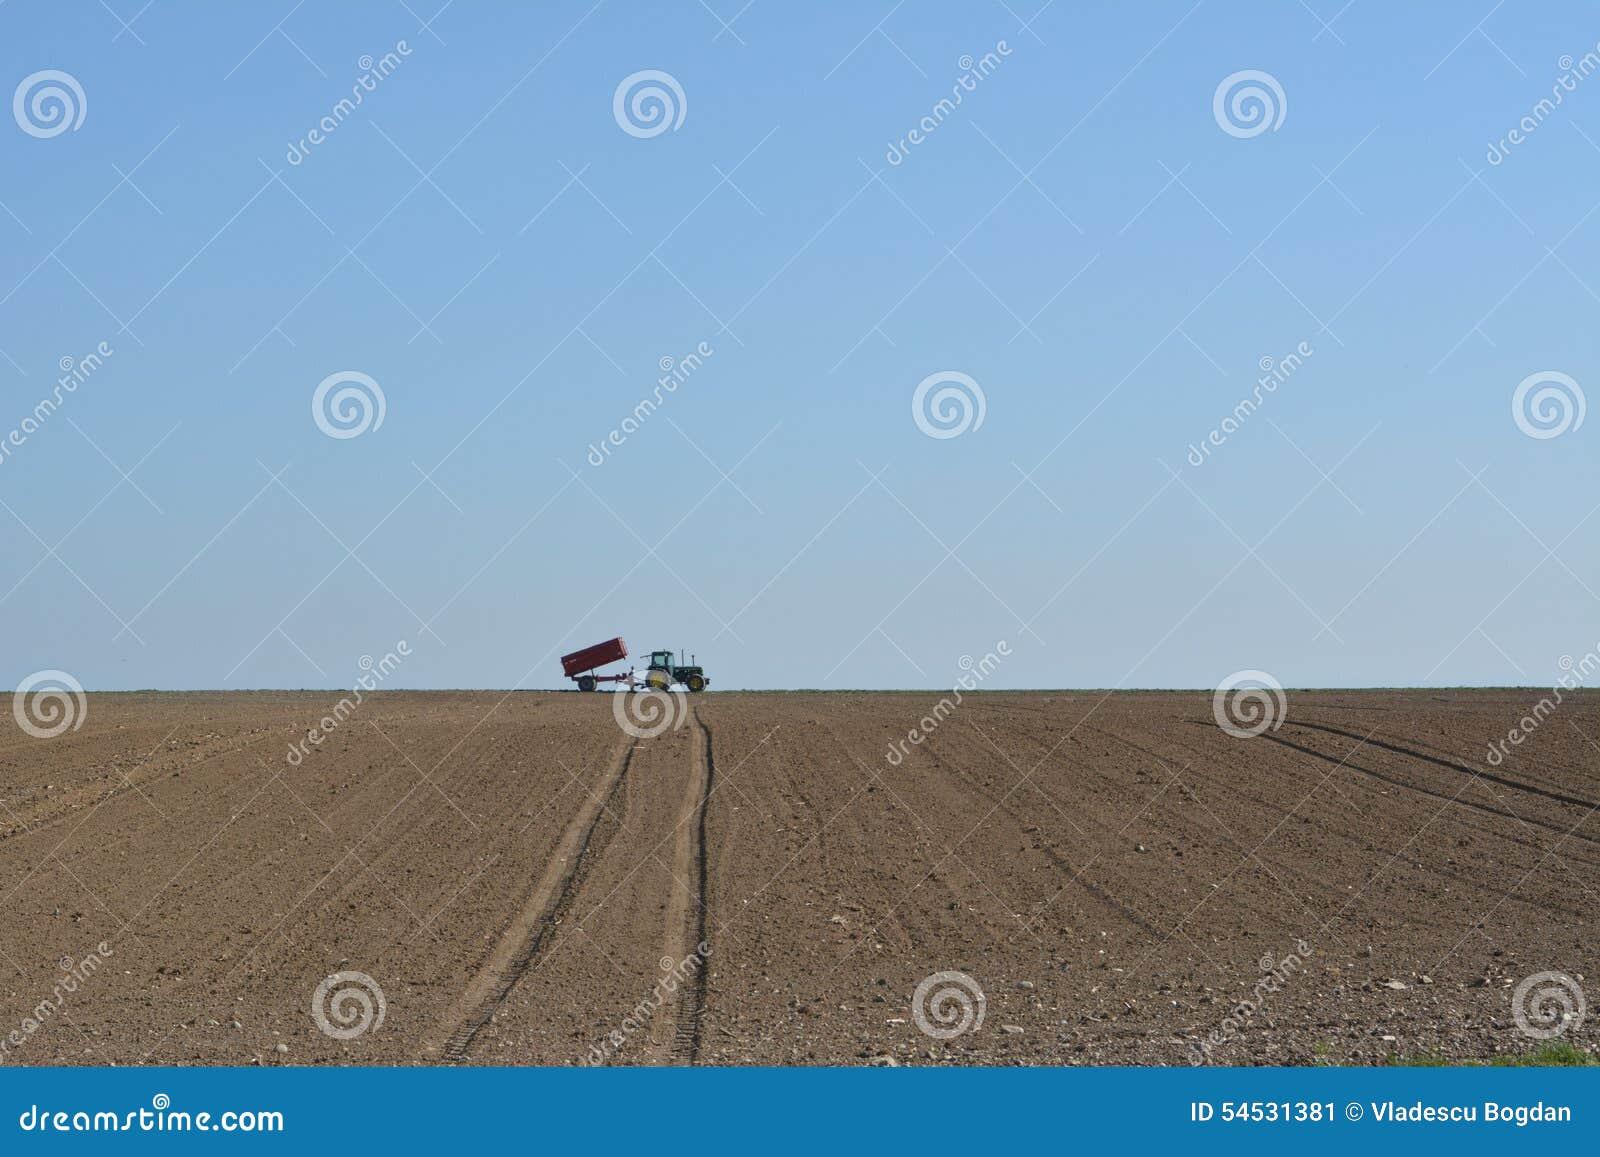 Tractor working on plowed field